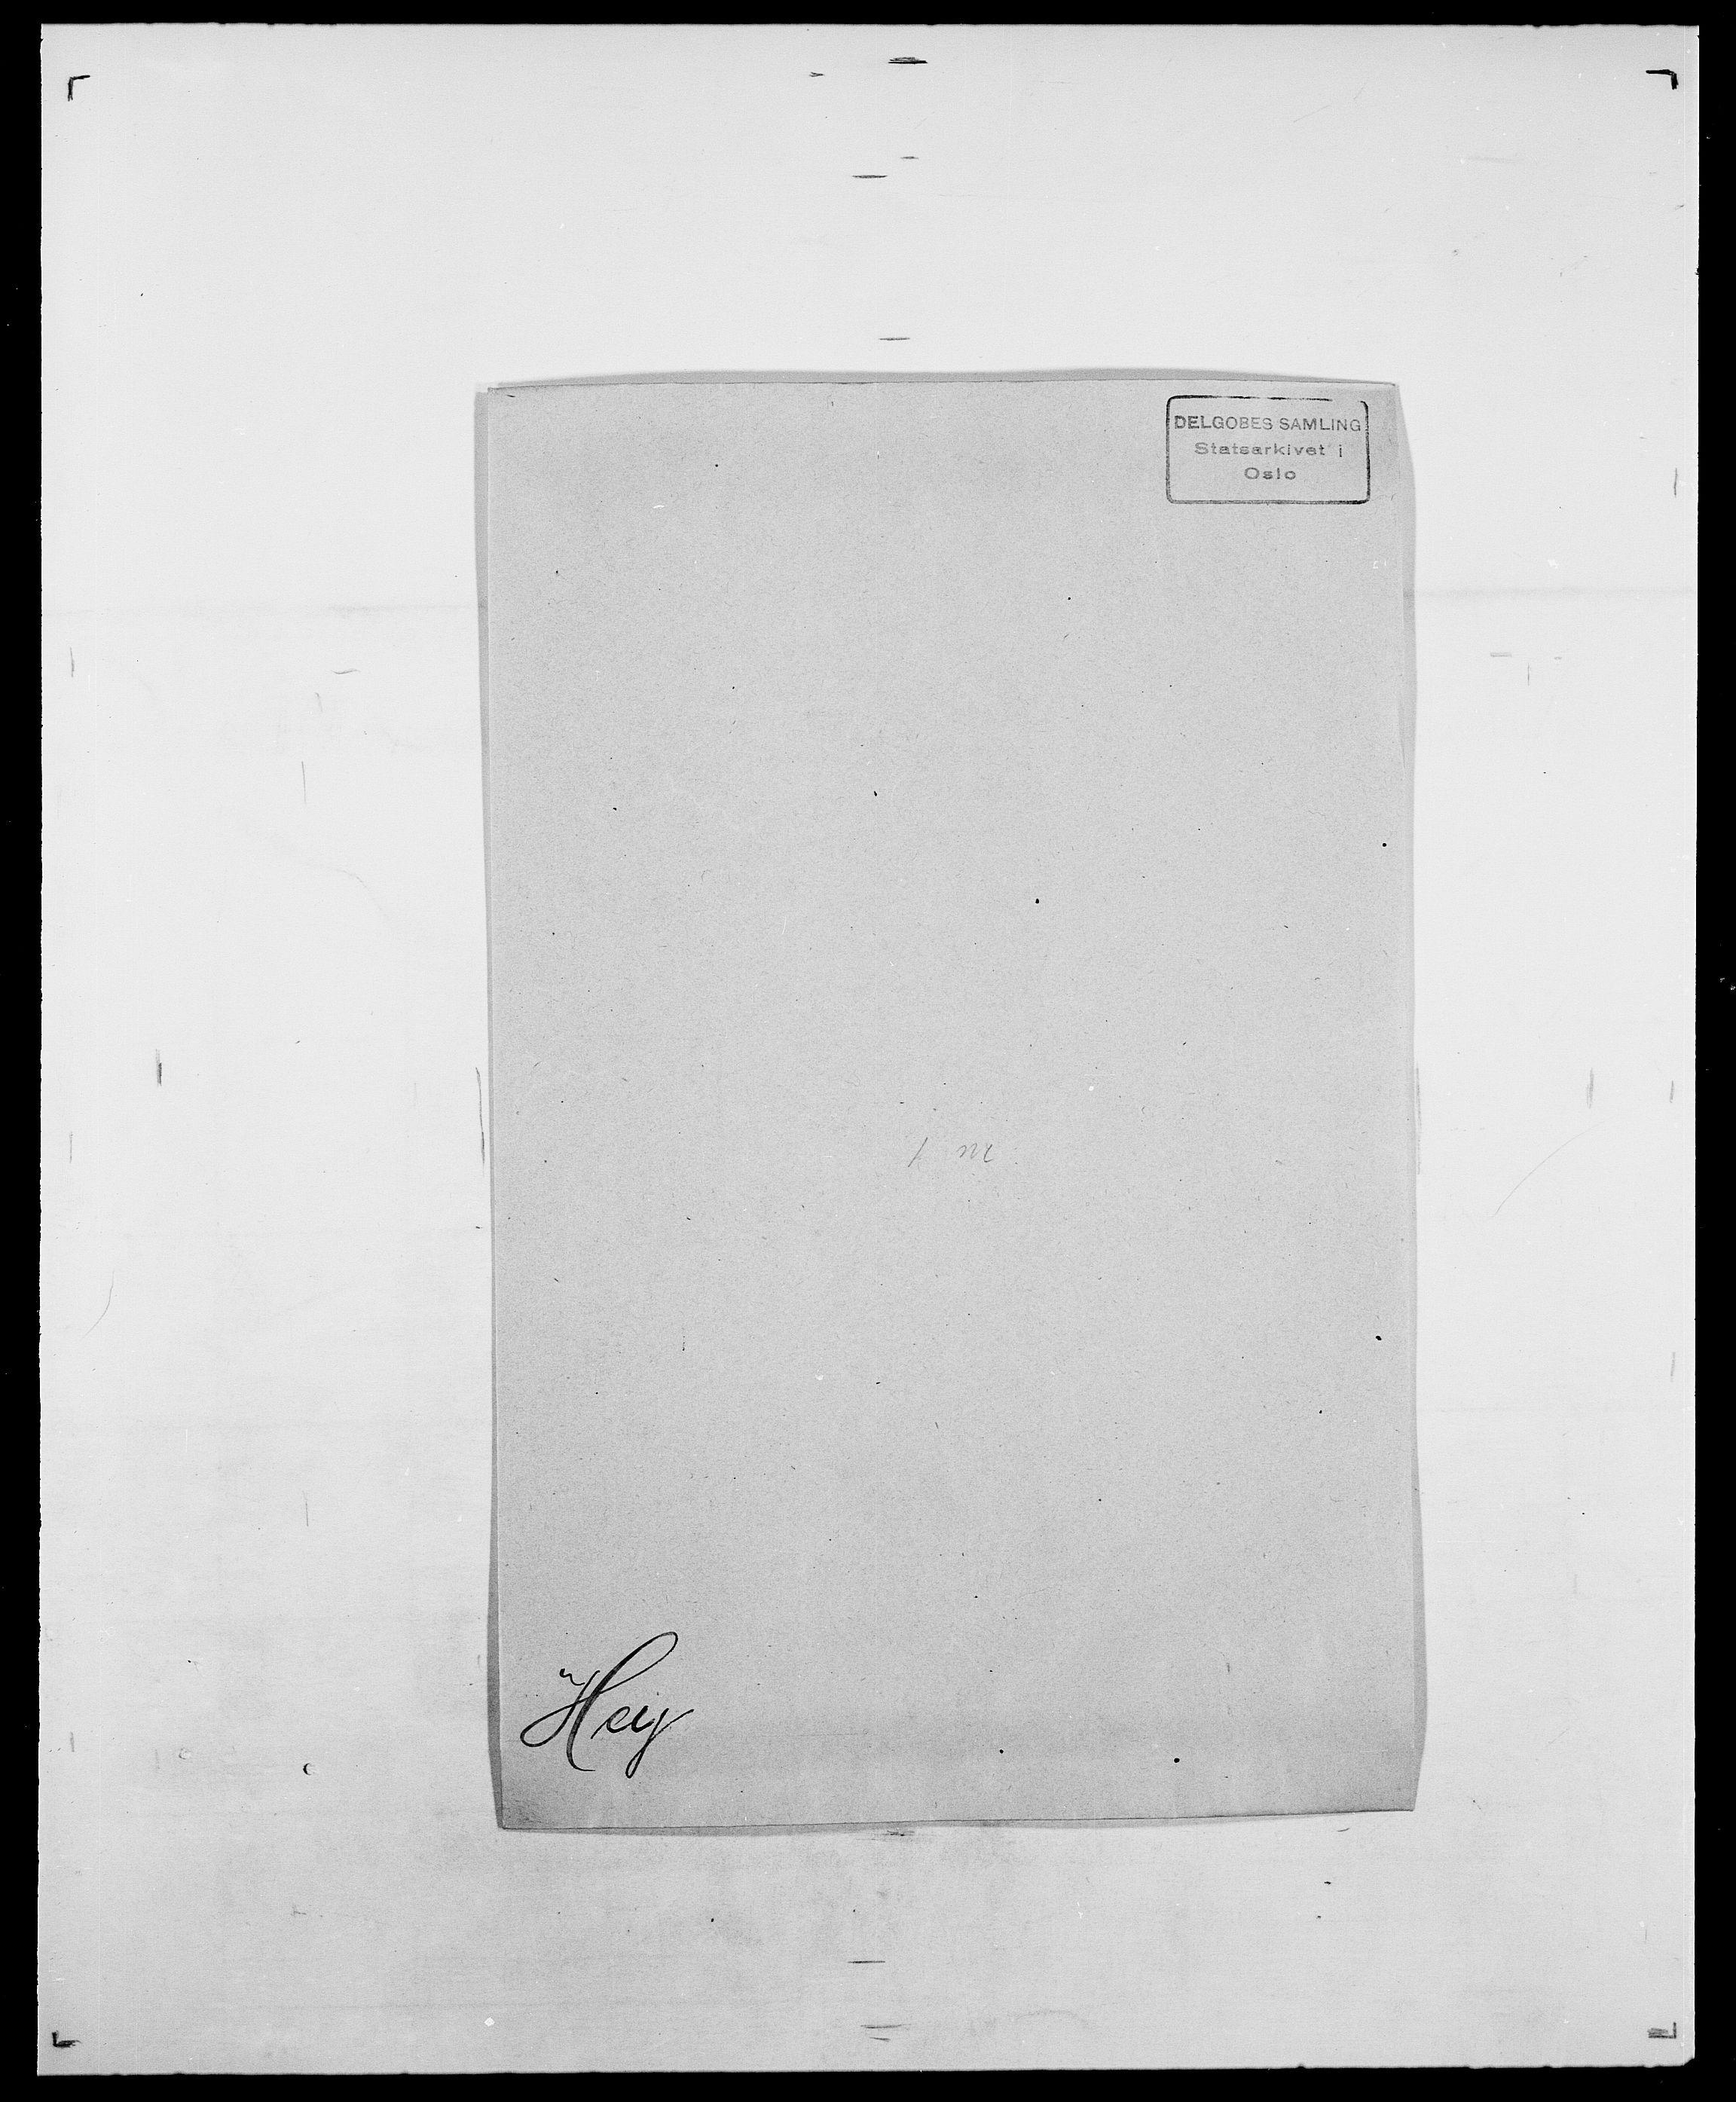 SAO, Delgobe, Charles Antoine - samling, D/Da/L0017: Helander - Hjørne, s. 375